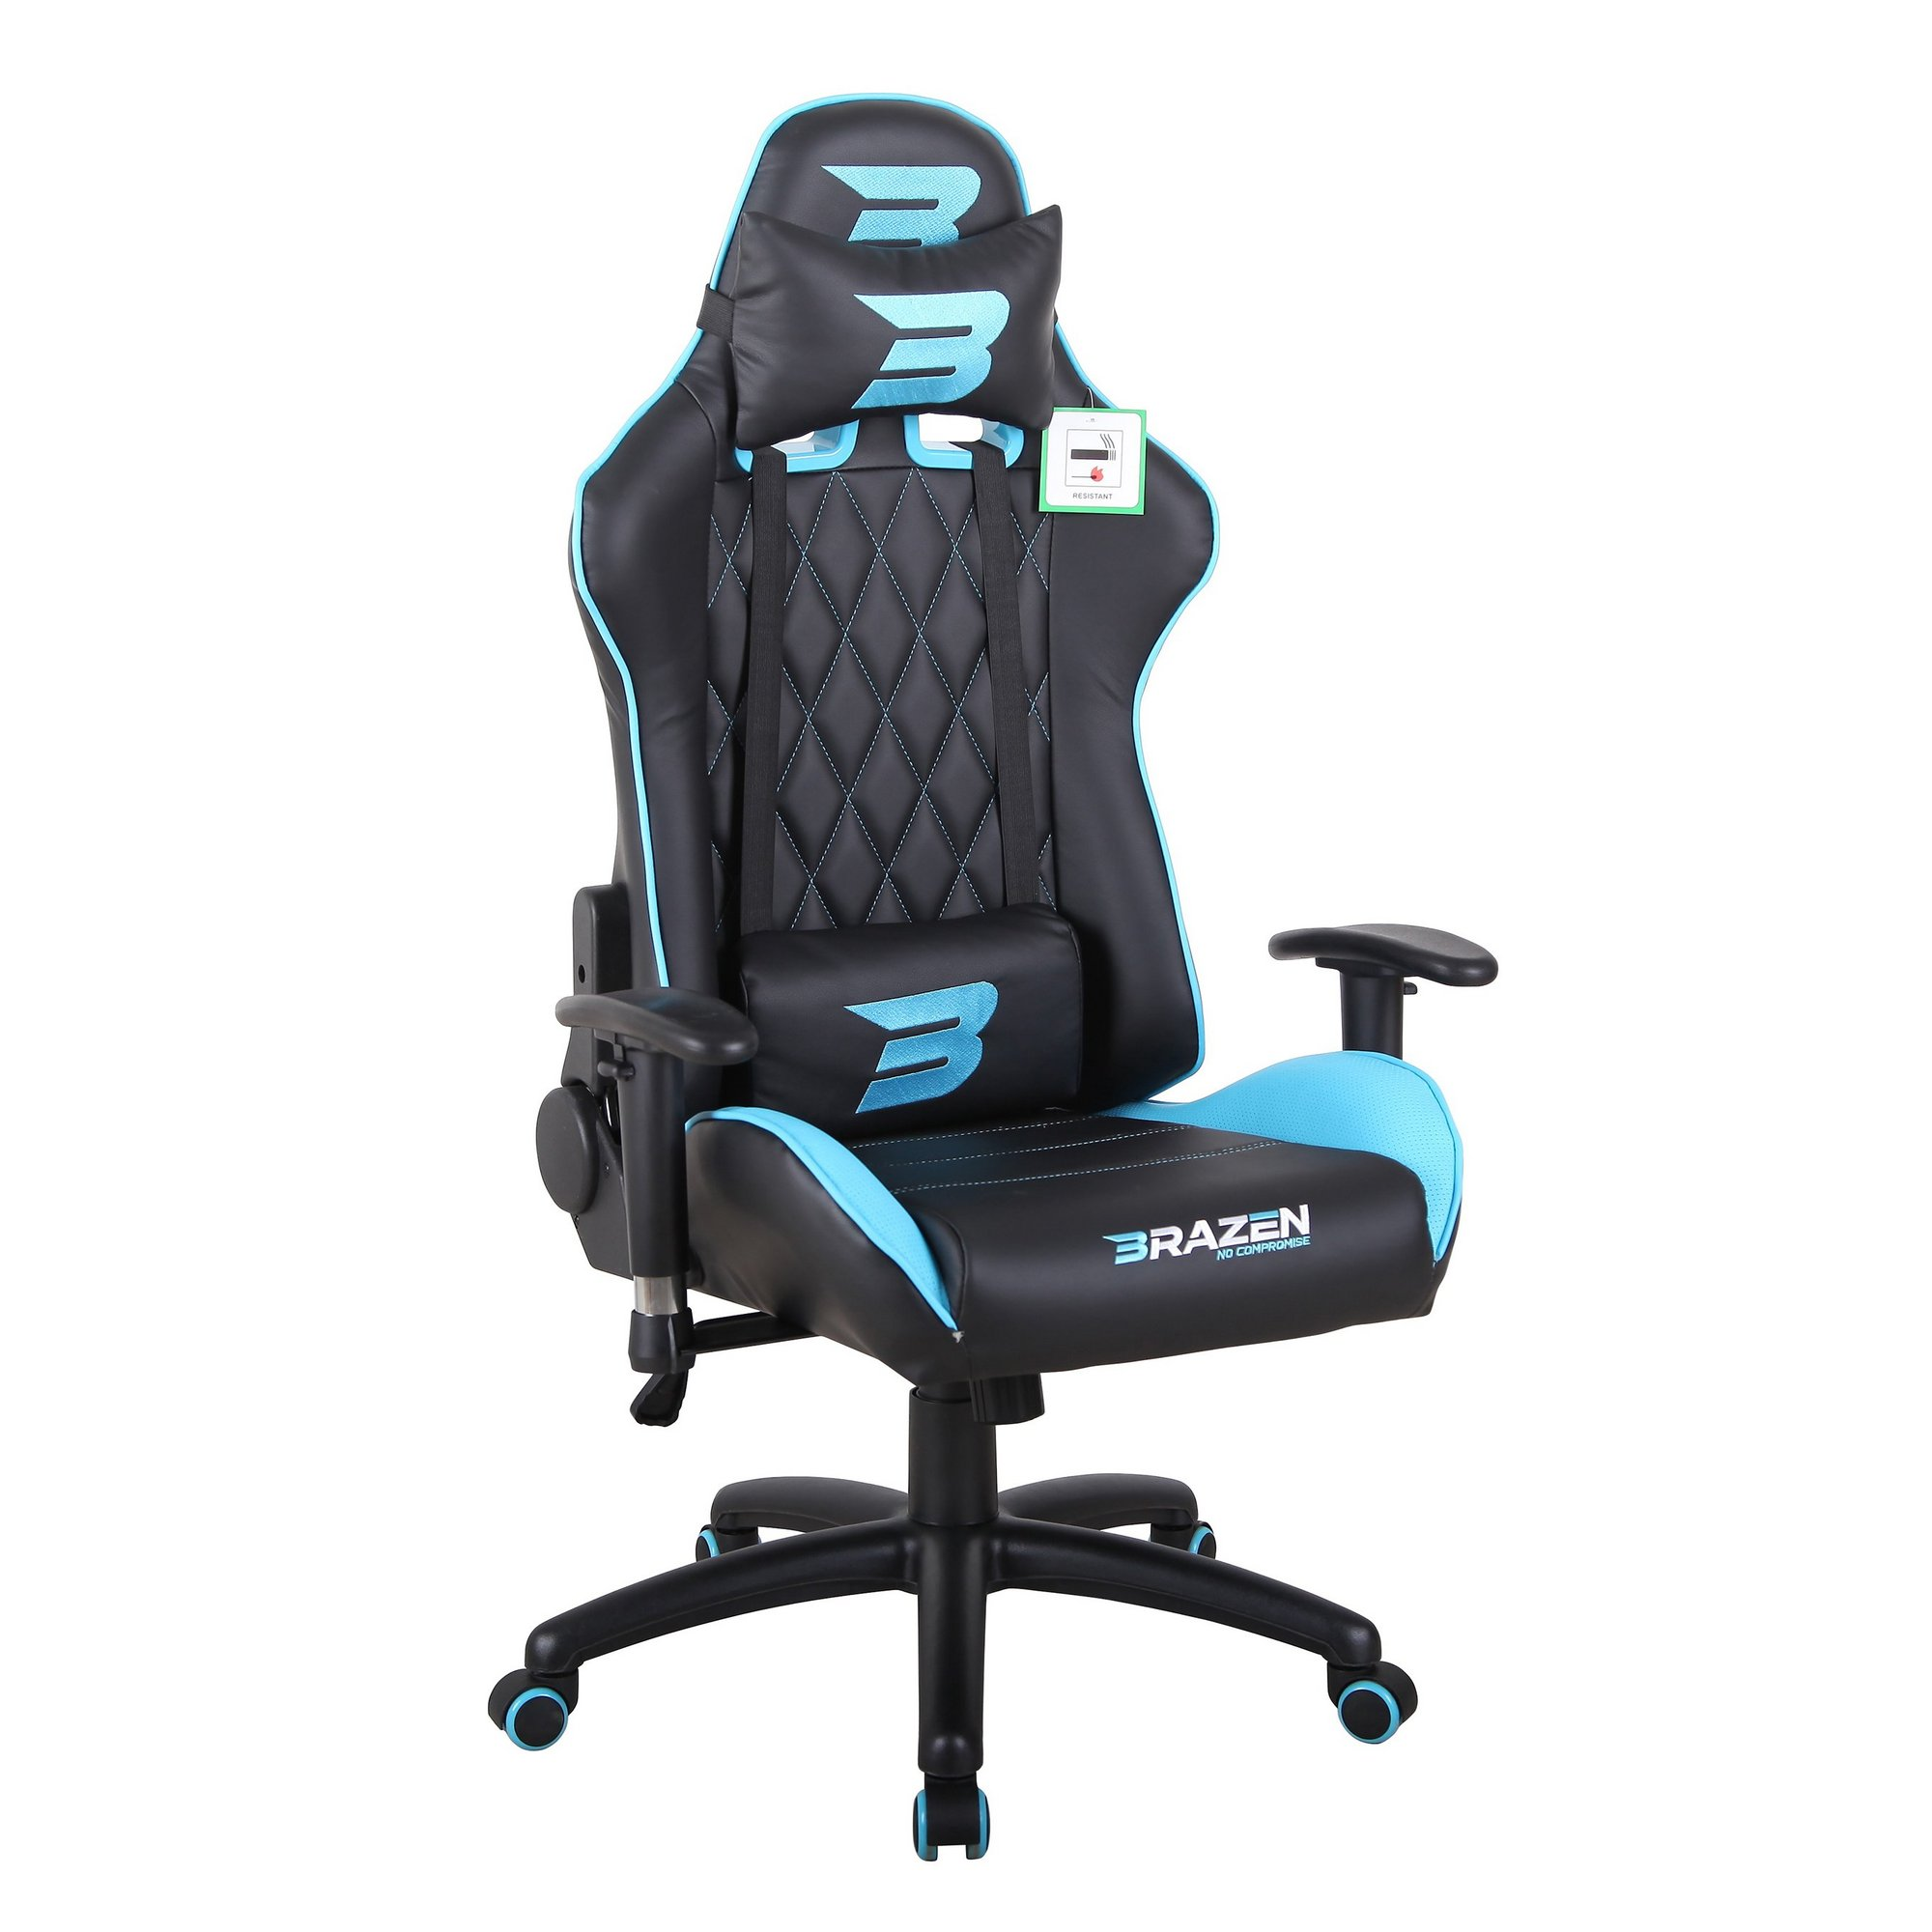 Image of BraZen Phantom Elite Racing Gaming Chair